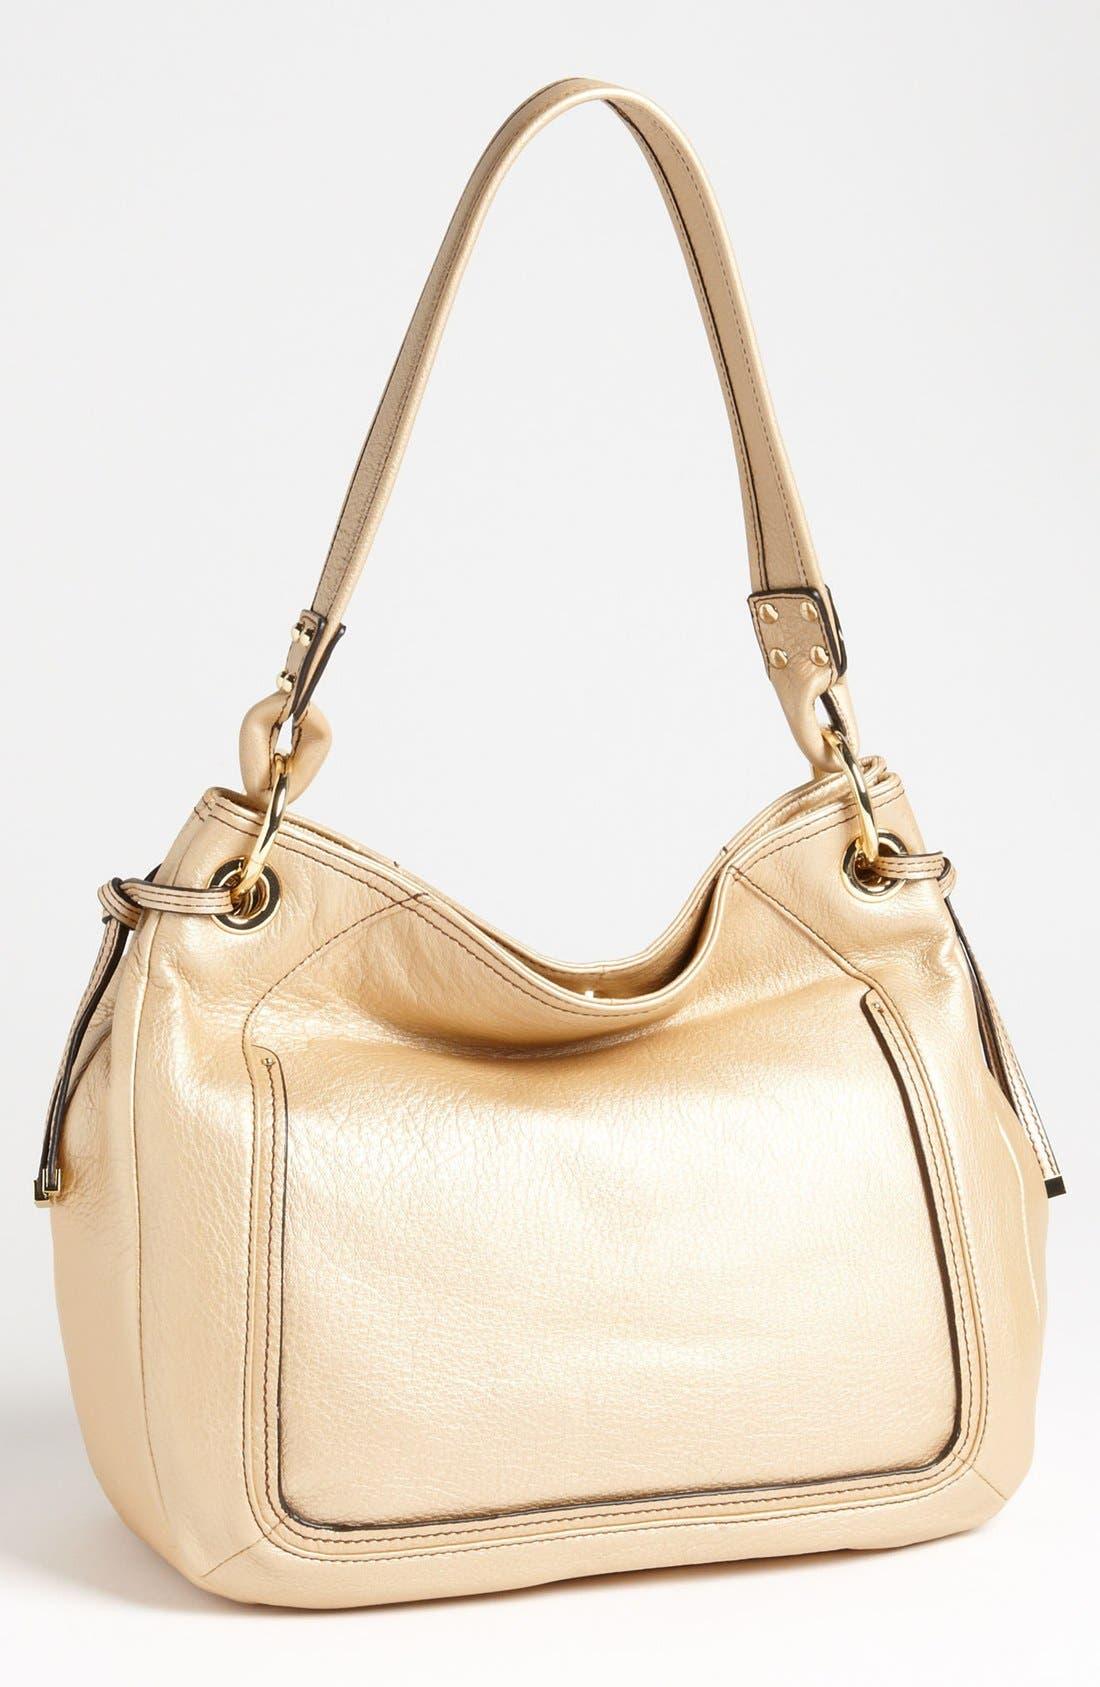 Main Image - Perlina 'Simone' Leather Hobo, Medium